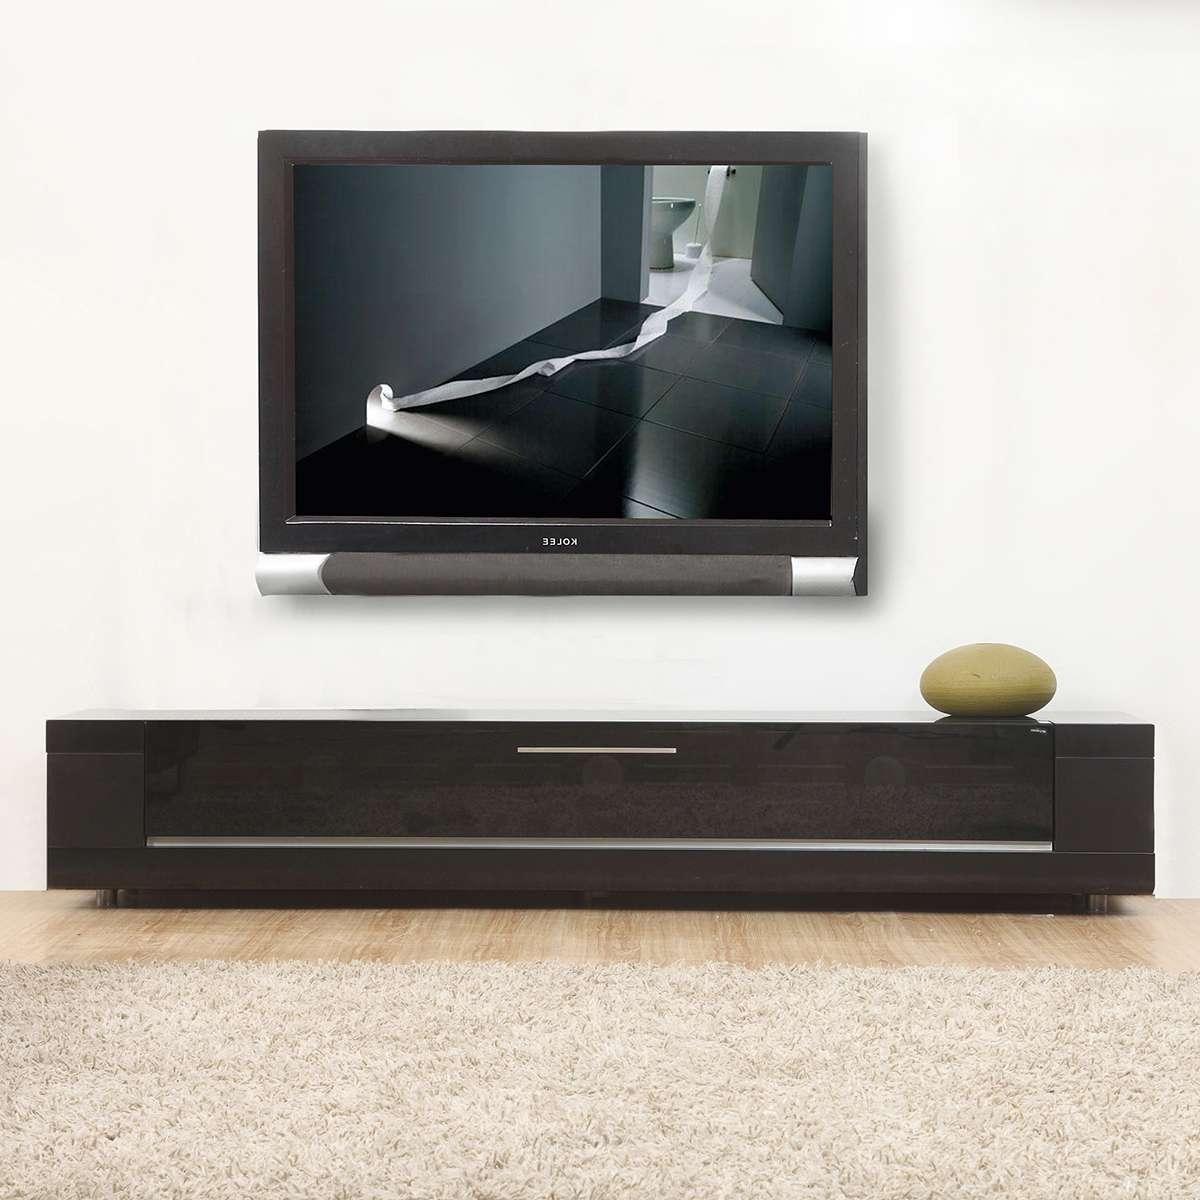 B Modern Minimalist Design Contemporary Tv Stands & Furniture At Within Contemporary Tv Stands (View 3 of 15)